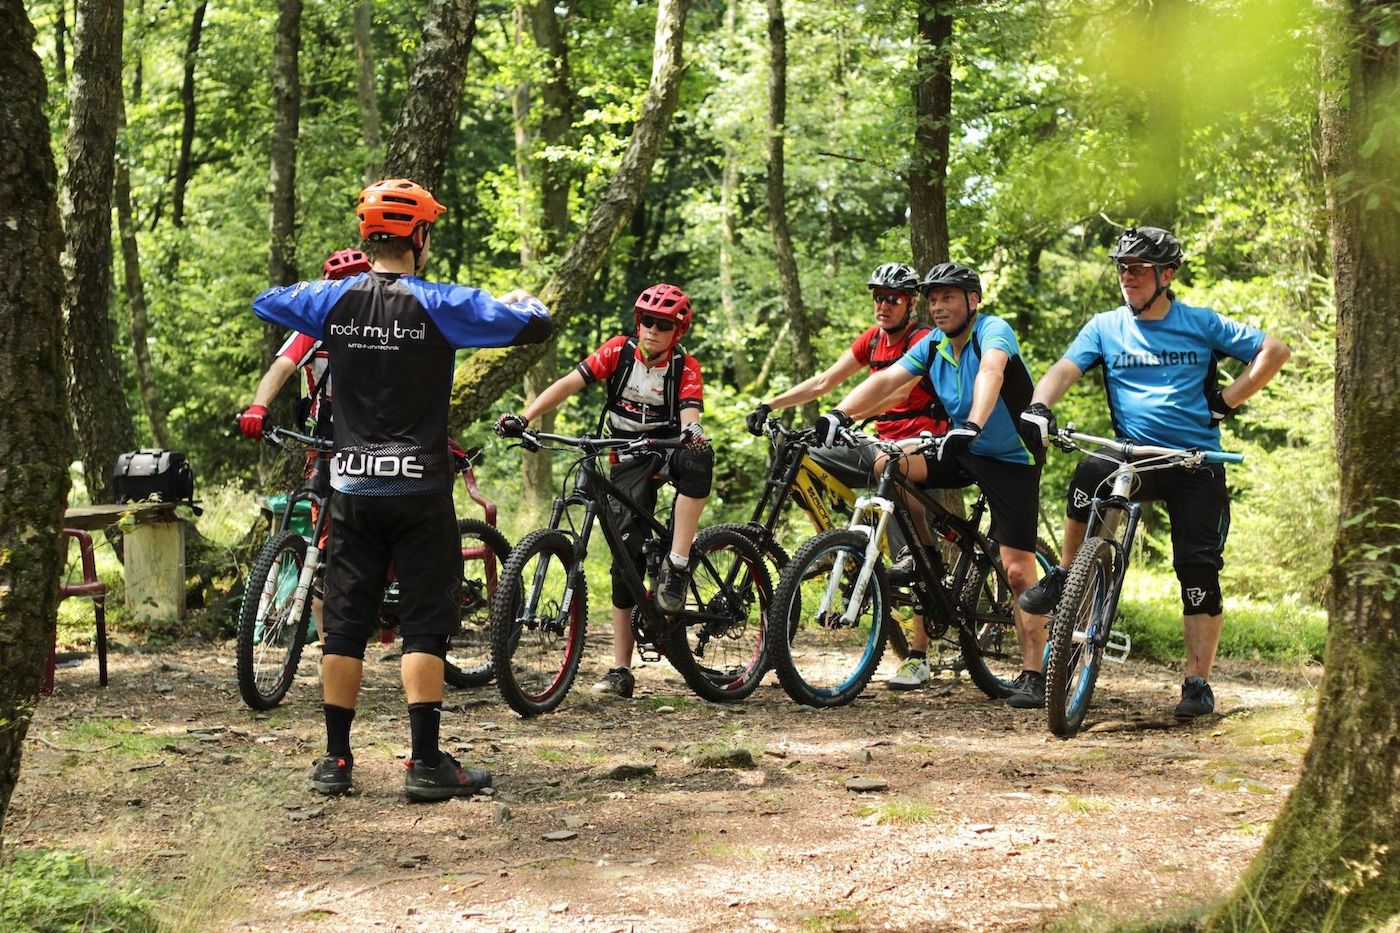 MTB Fahrtechnik Kurse in Ravensburg Bodensee Training Trails Rock my Trail Bikeschule -1